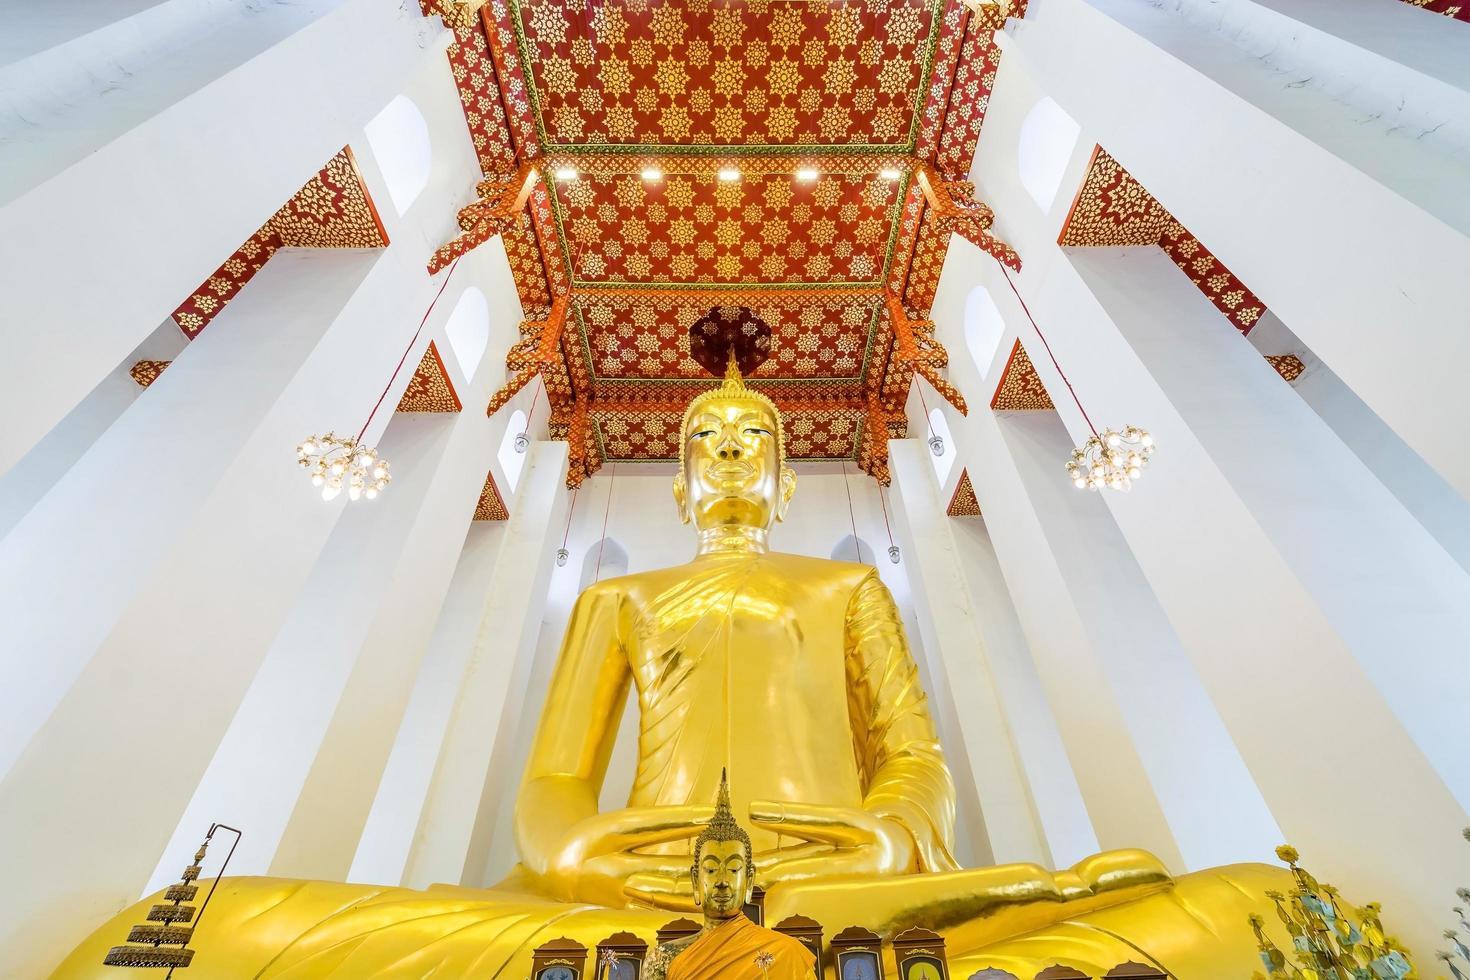 Goldener Buddha im Wat Chaiyo Warawithan Tempel, Provinz Angthong, Thailand foto